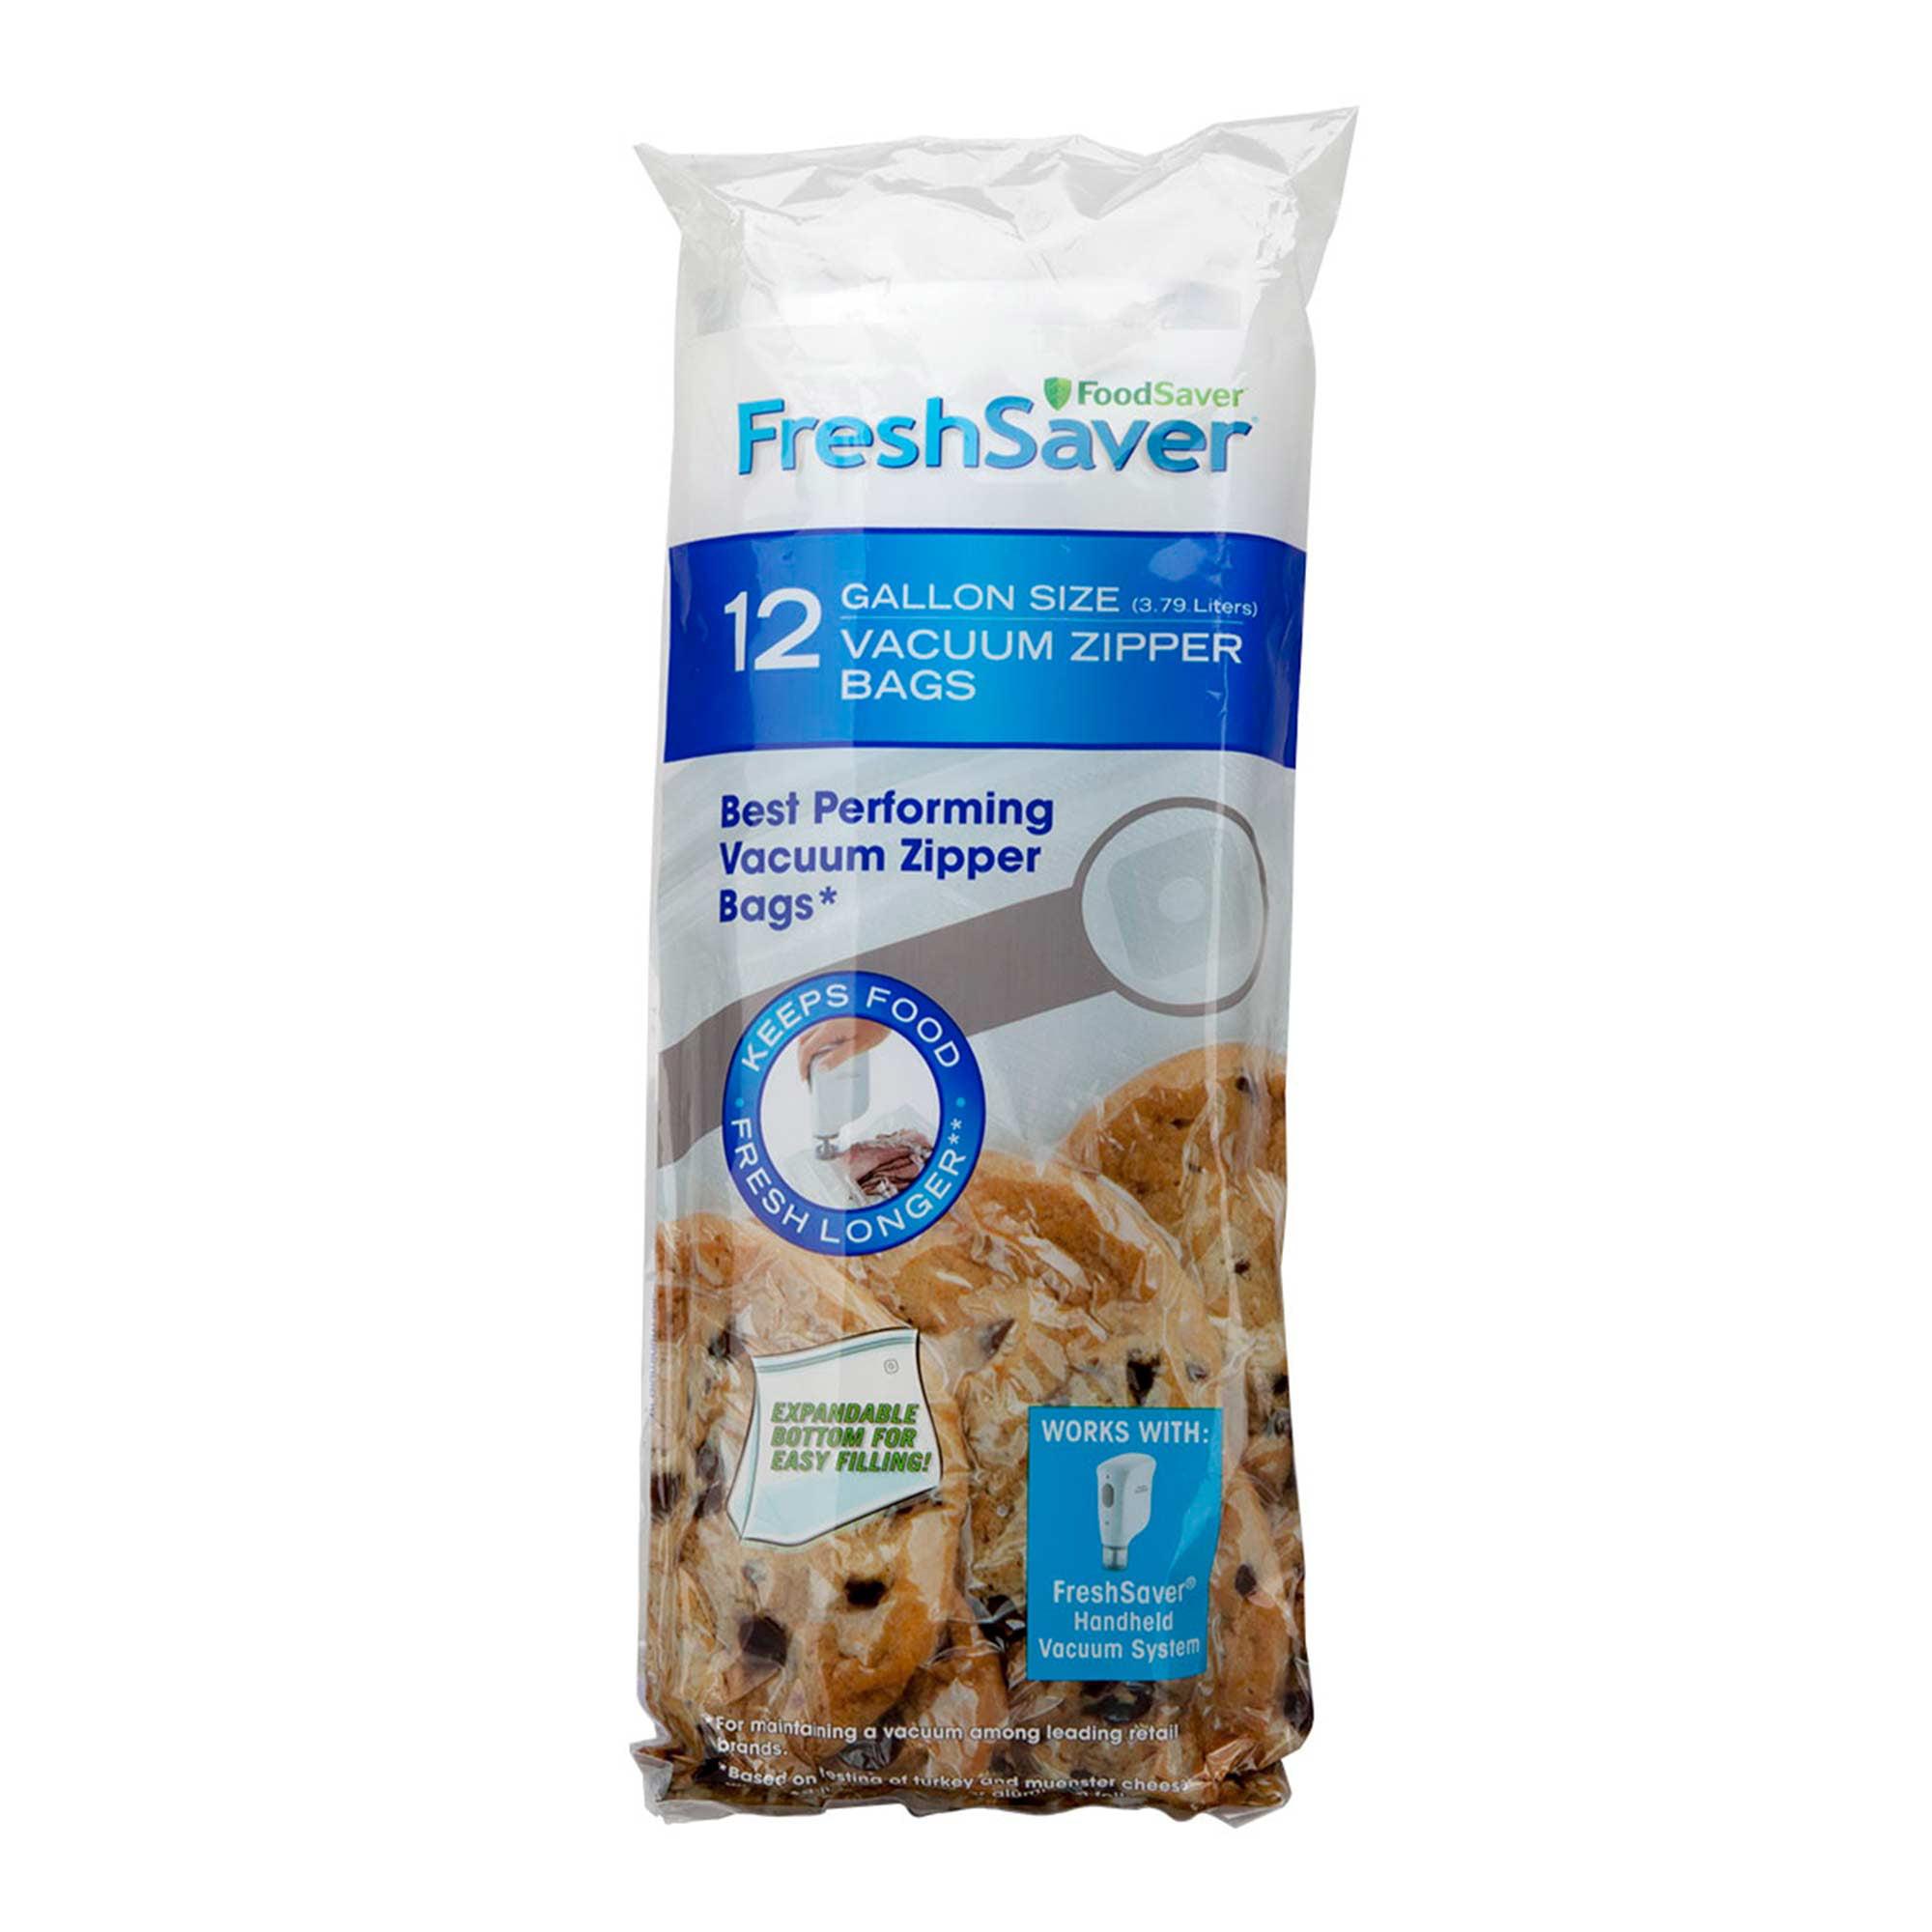 Foodsaver Freshsaver 1 Gallon Vacuum Zipper Bags 12 Count